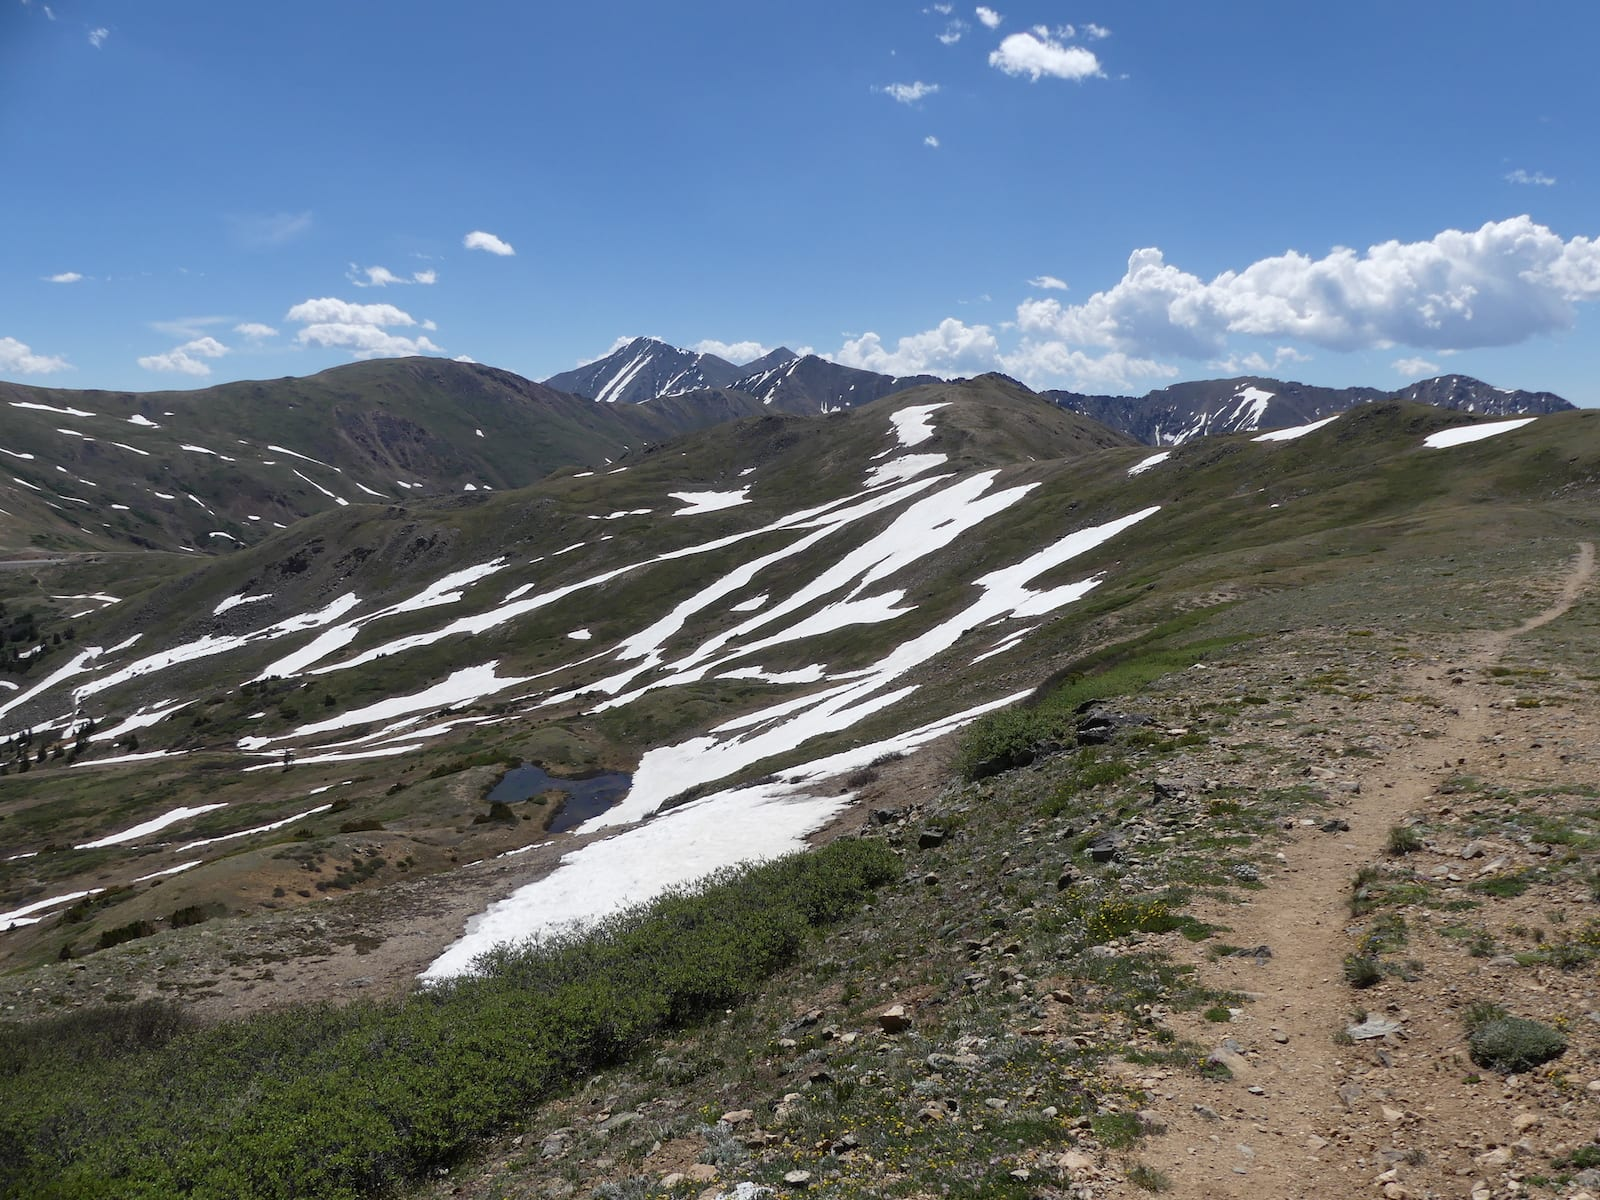 West Ridge Trail from Loveland Pass, CO